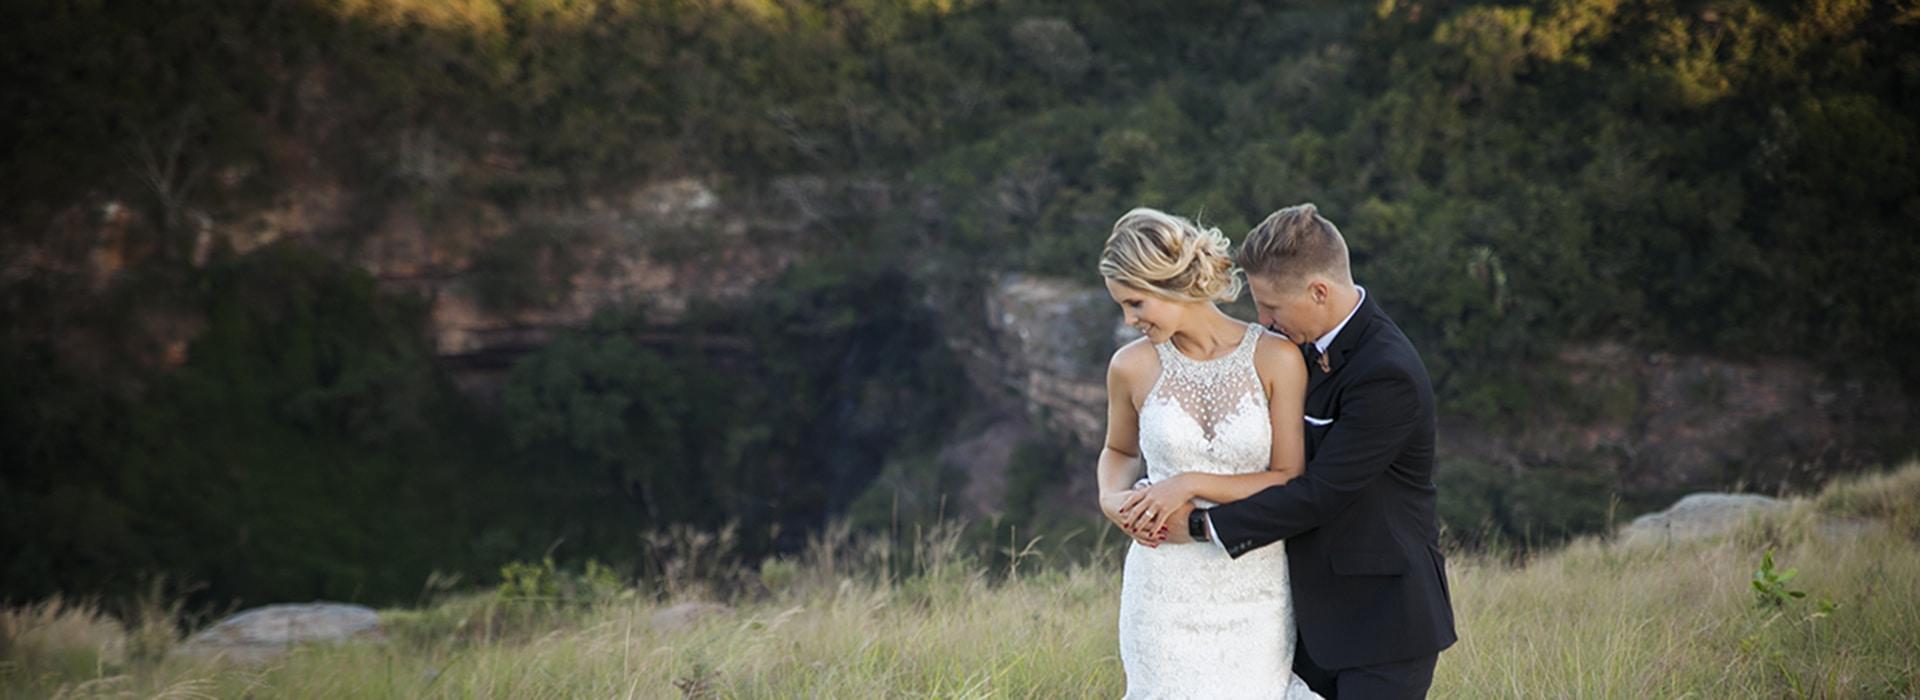 PRICE WEDDING